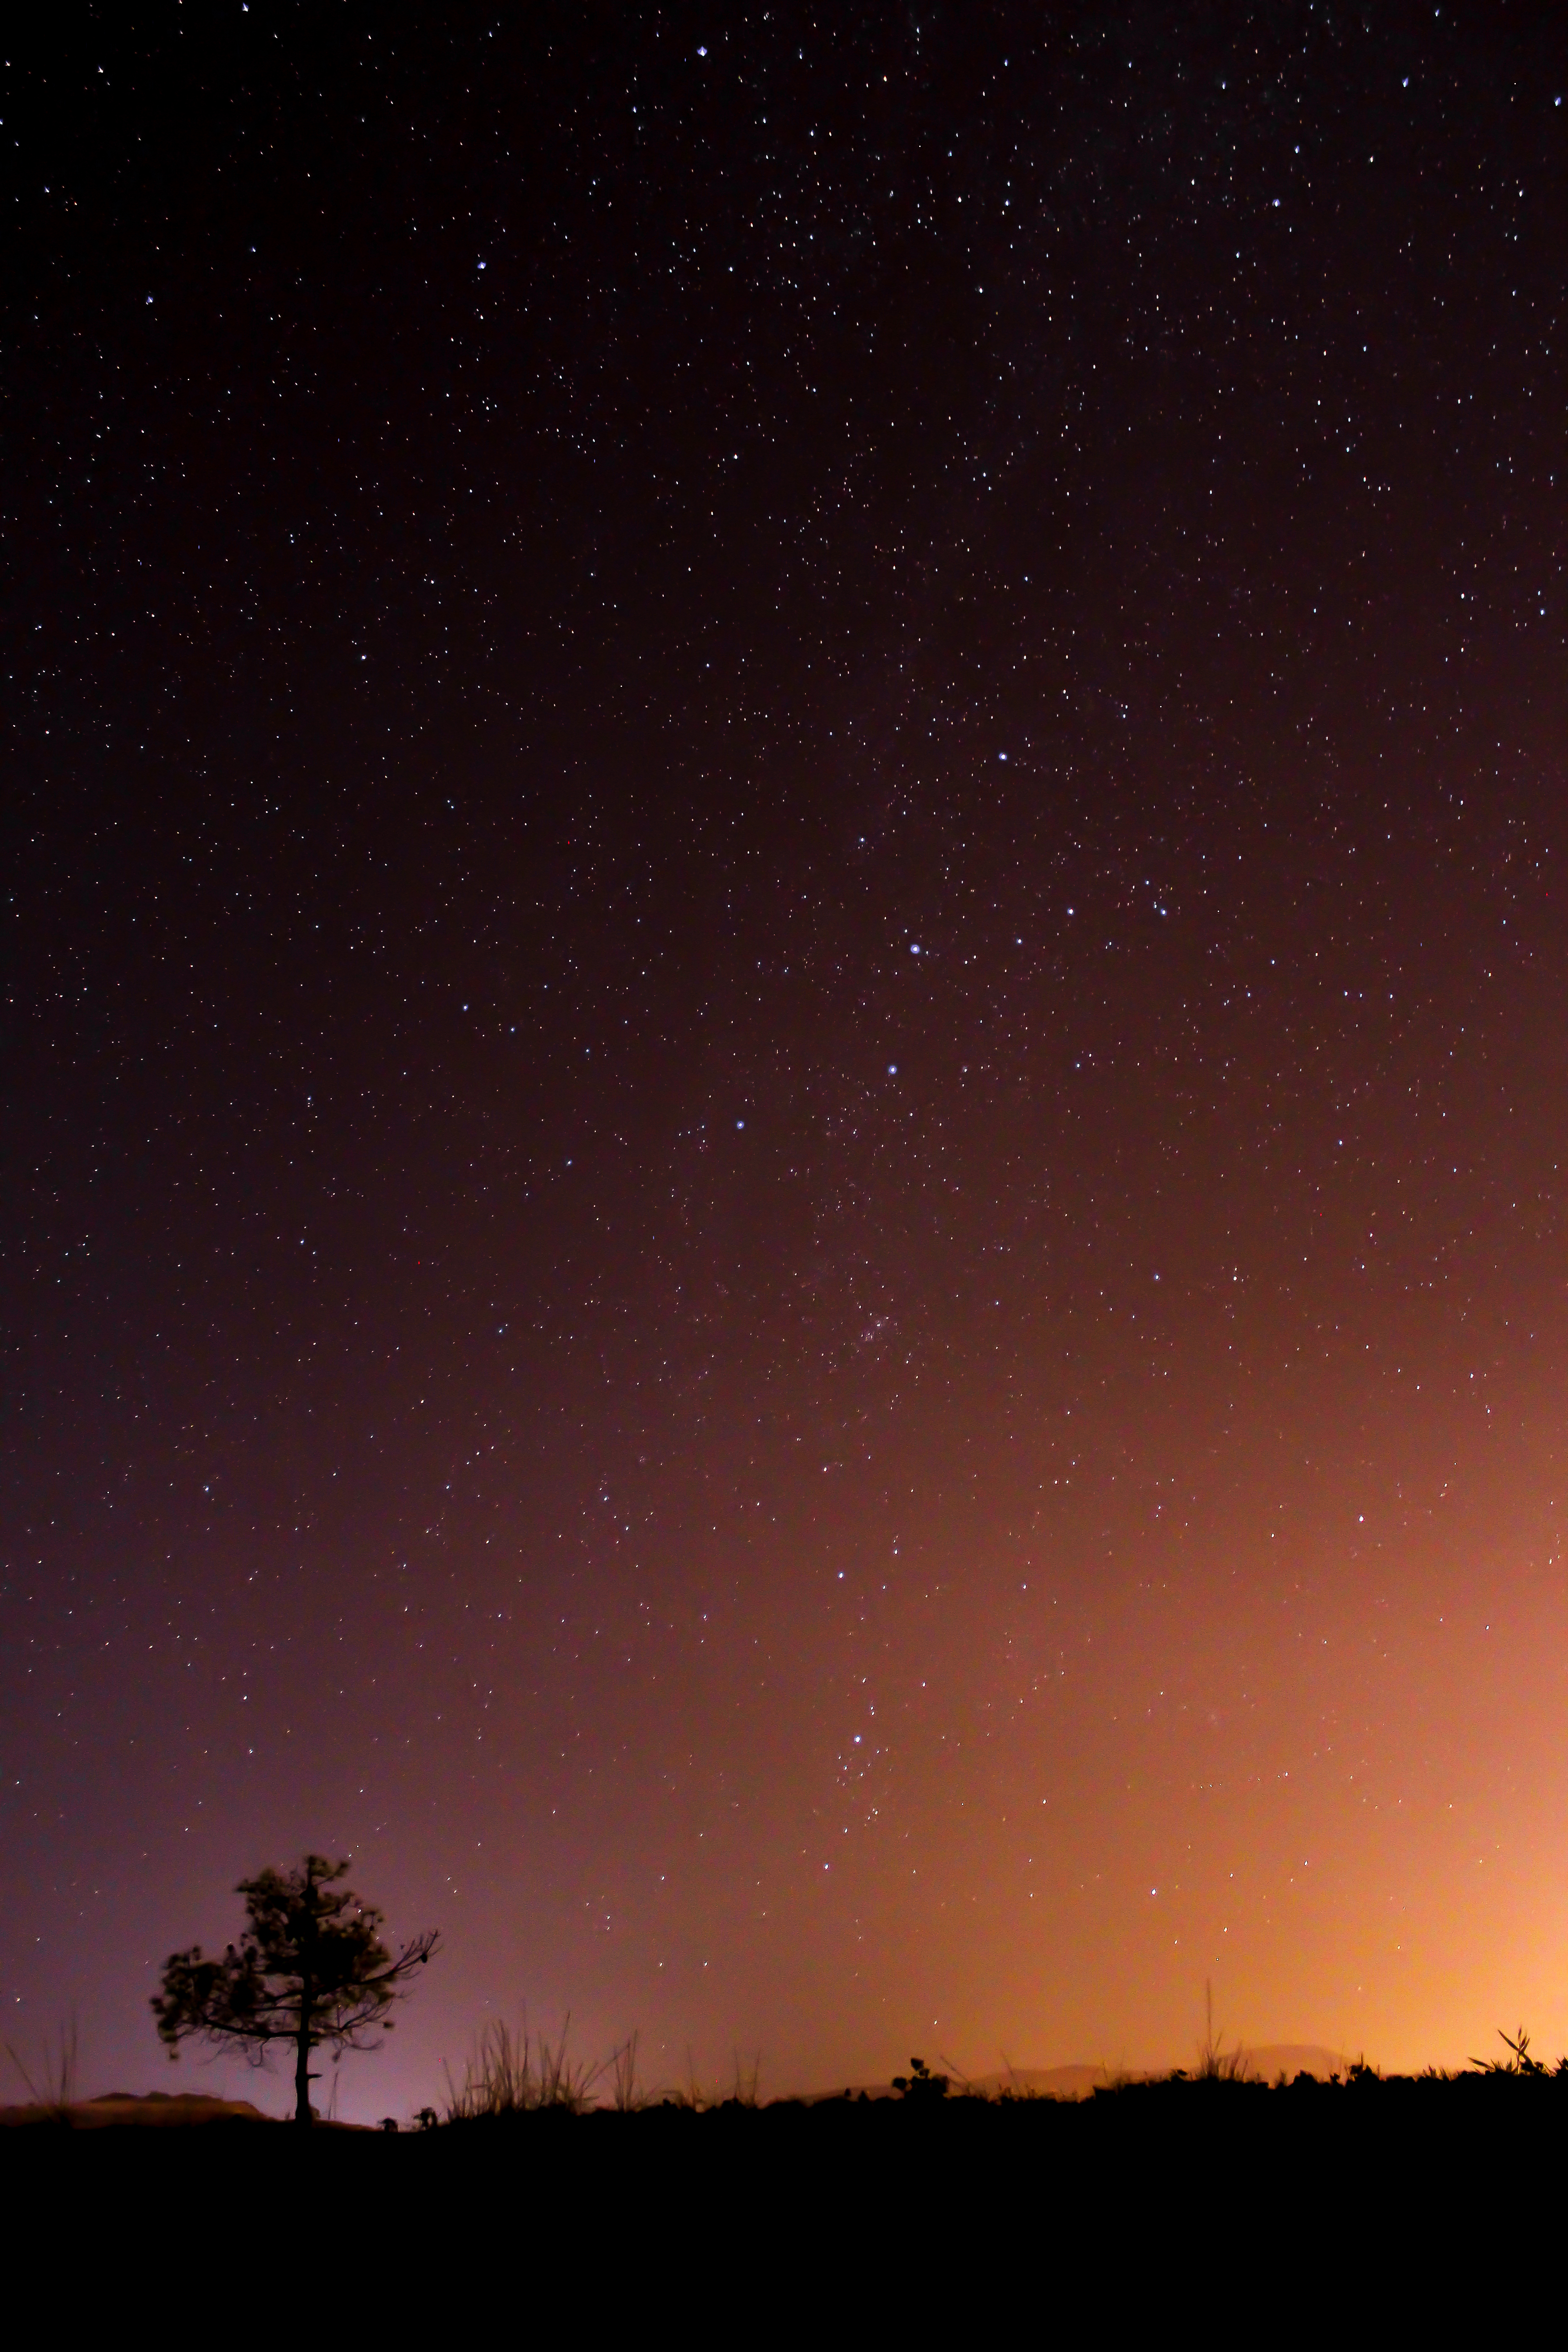 black and orange night sky photo by dimitris adalialis